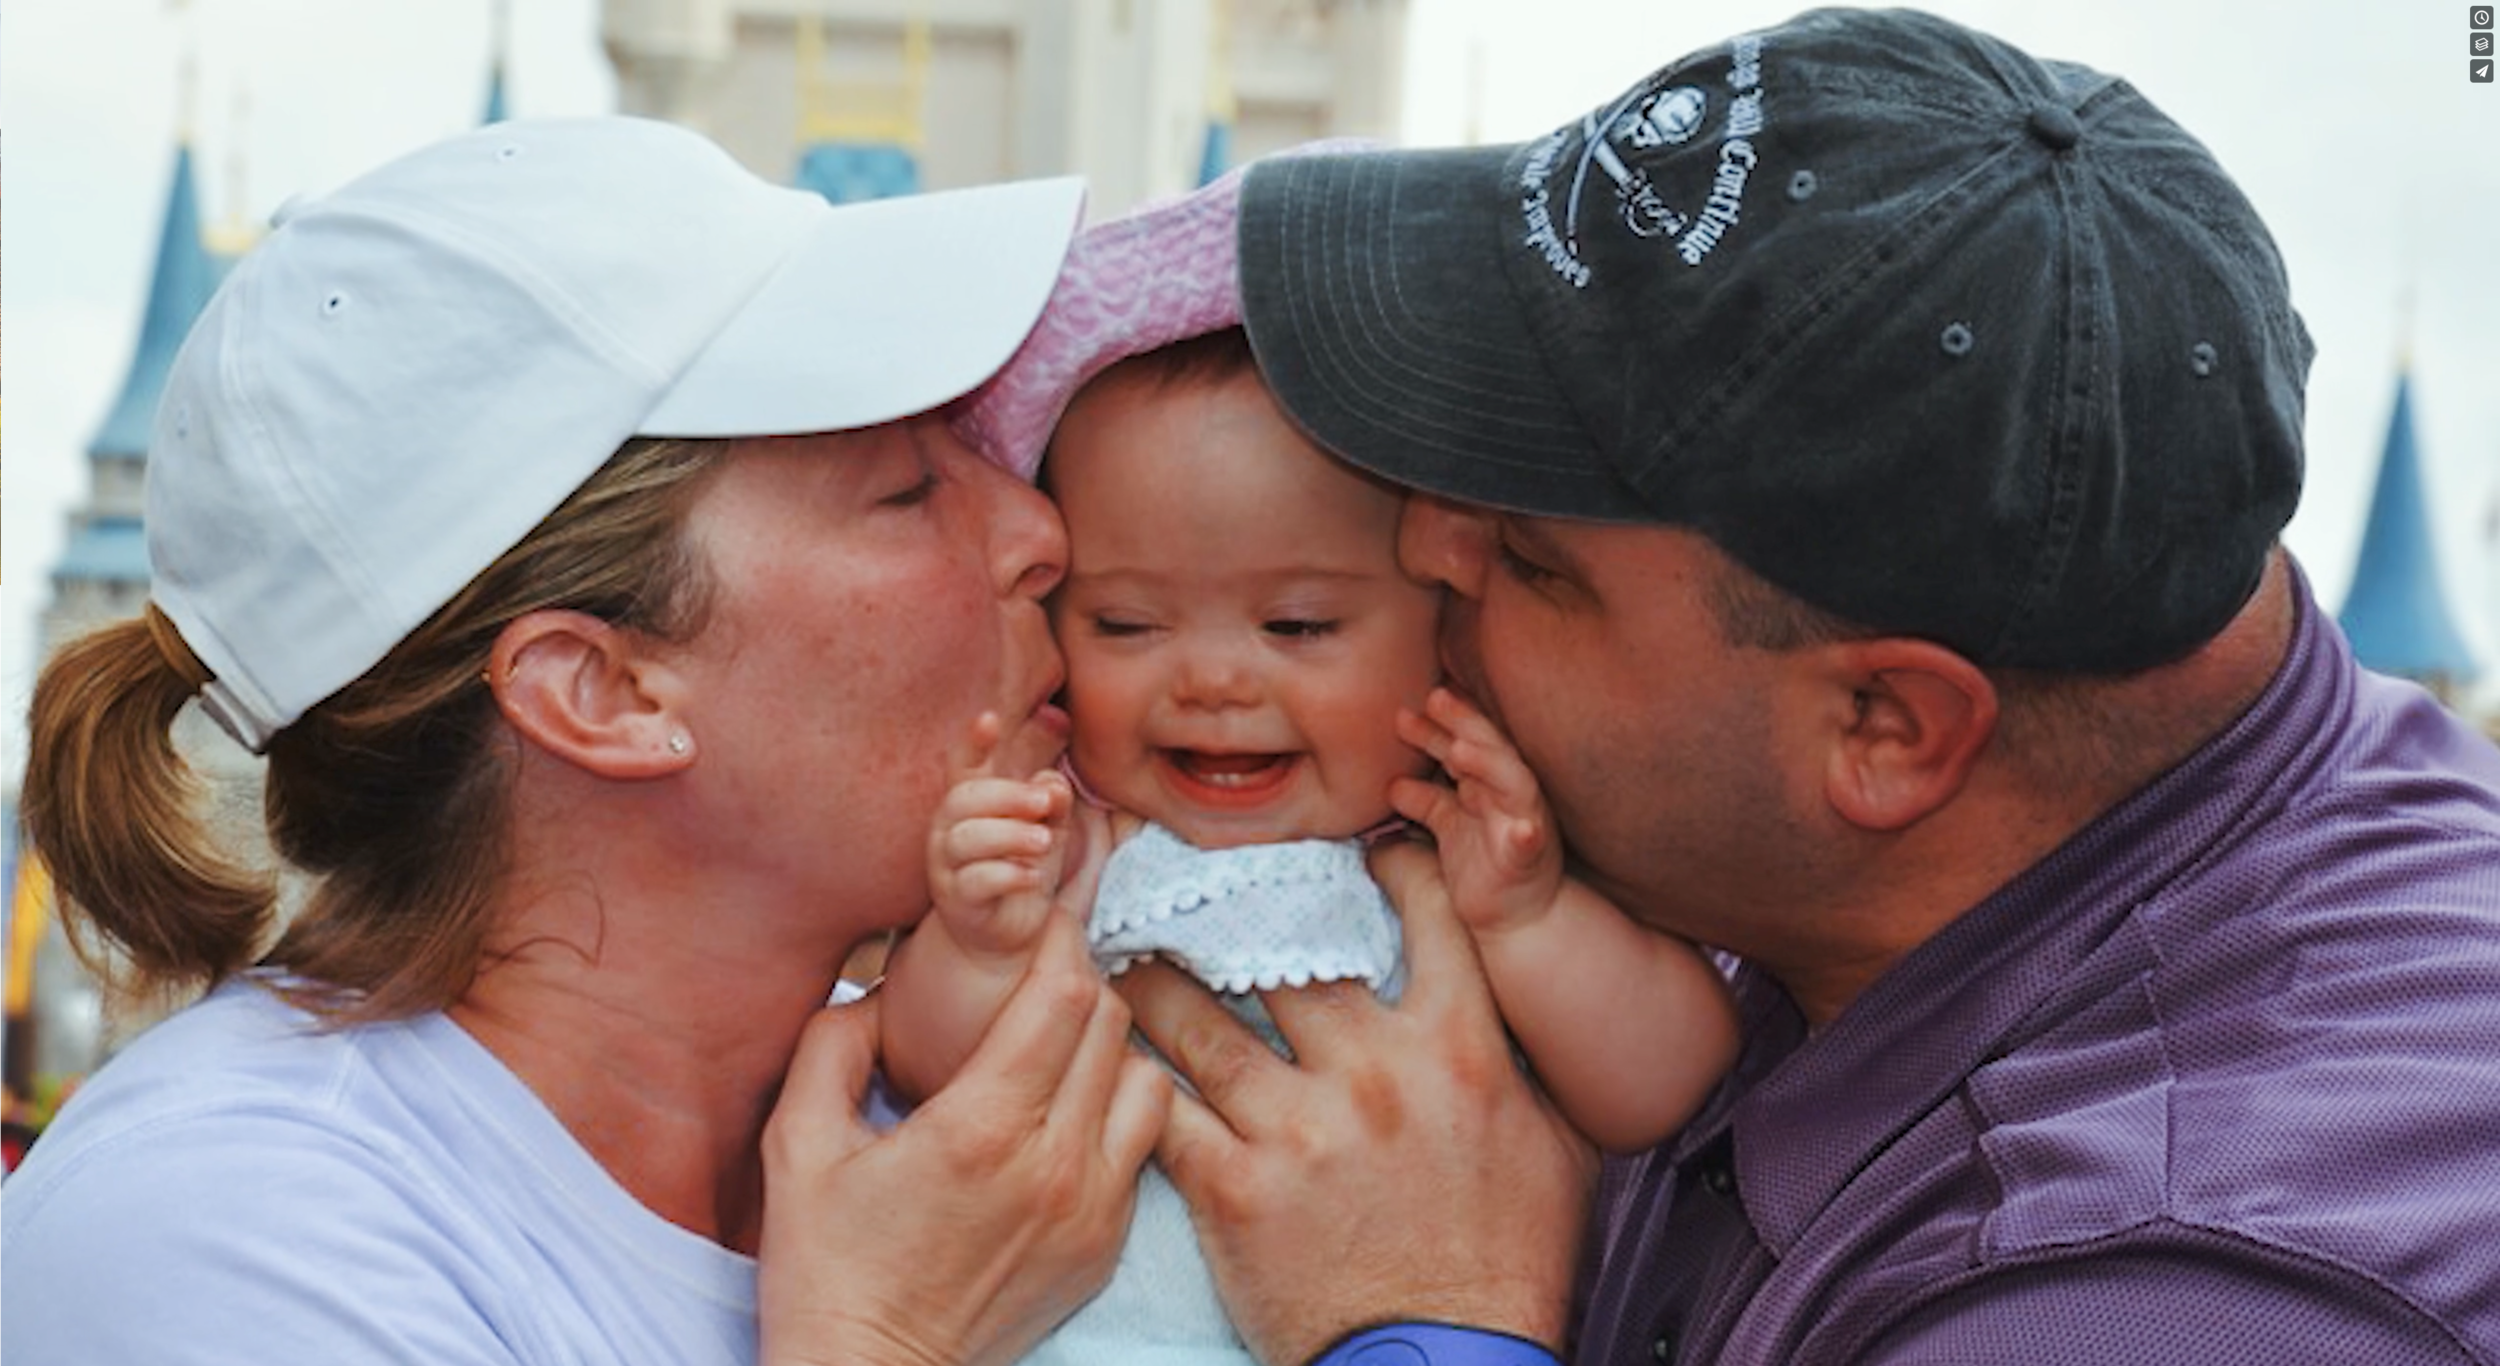 evolve - adoption + family services